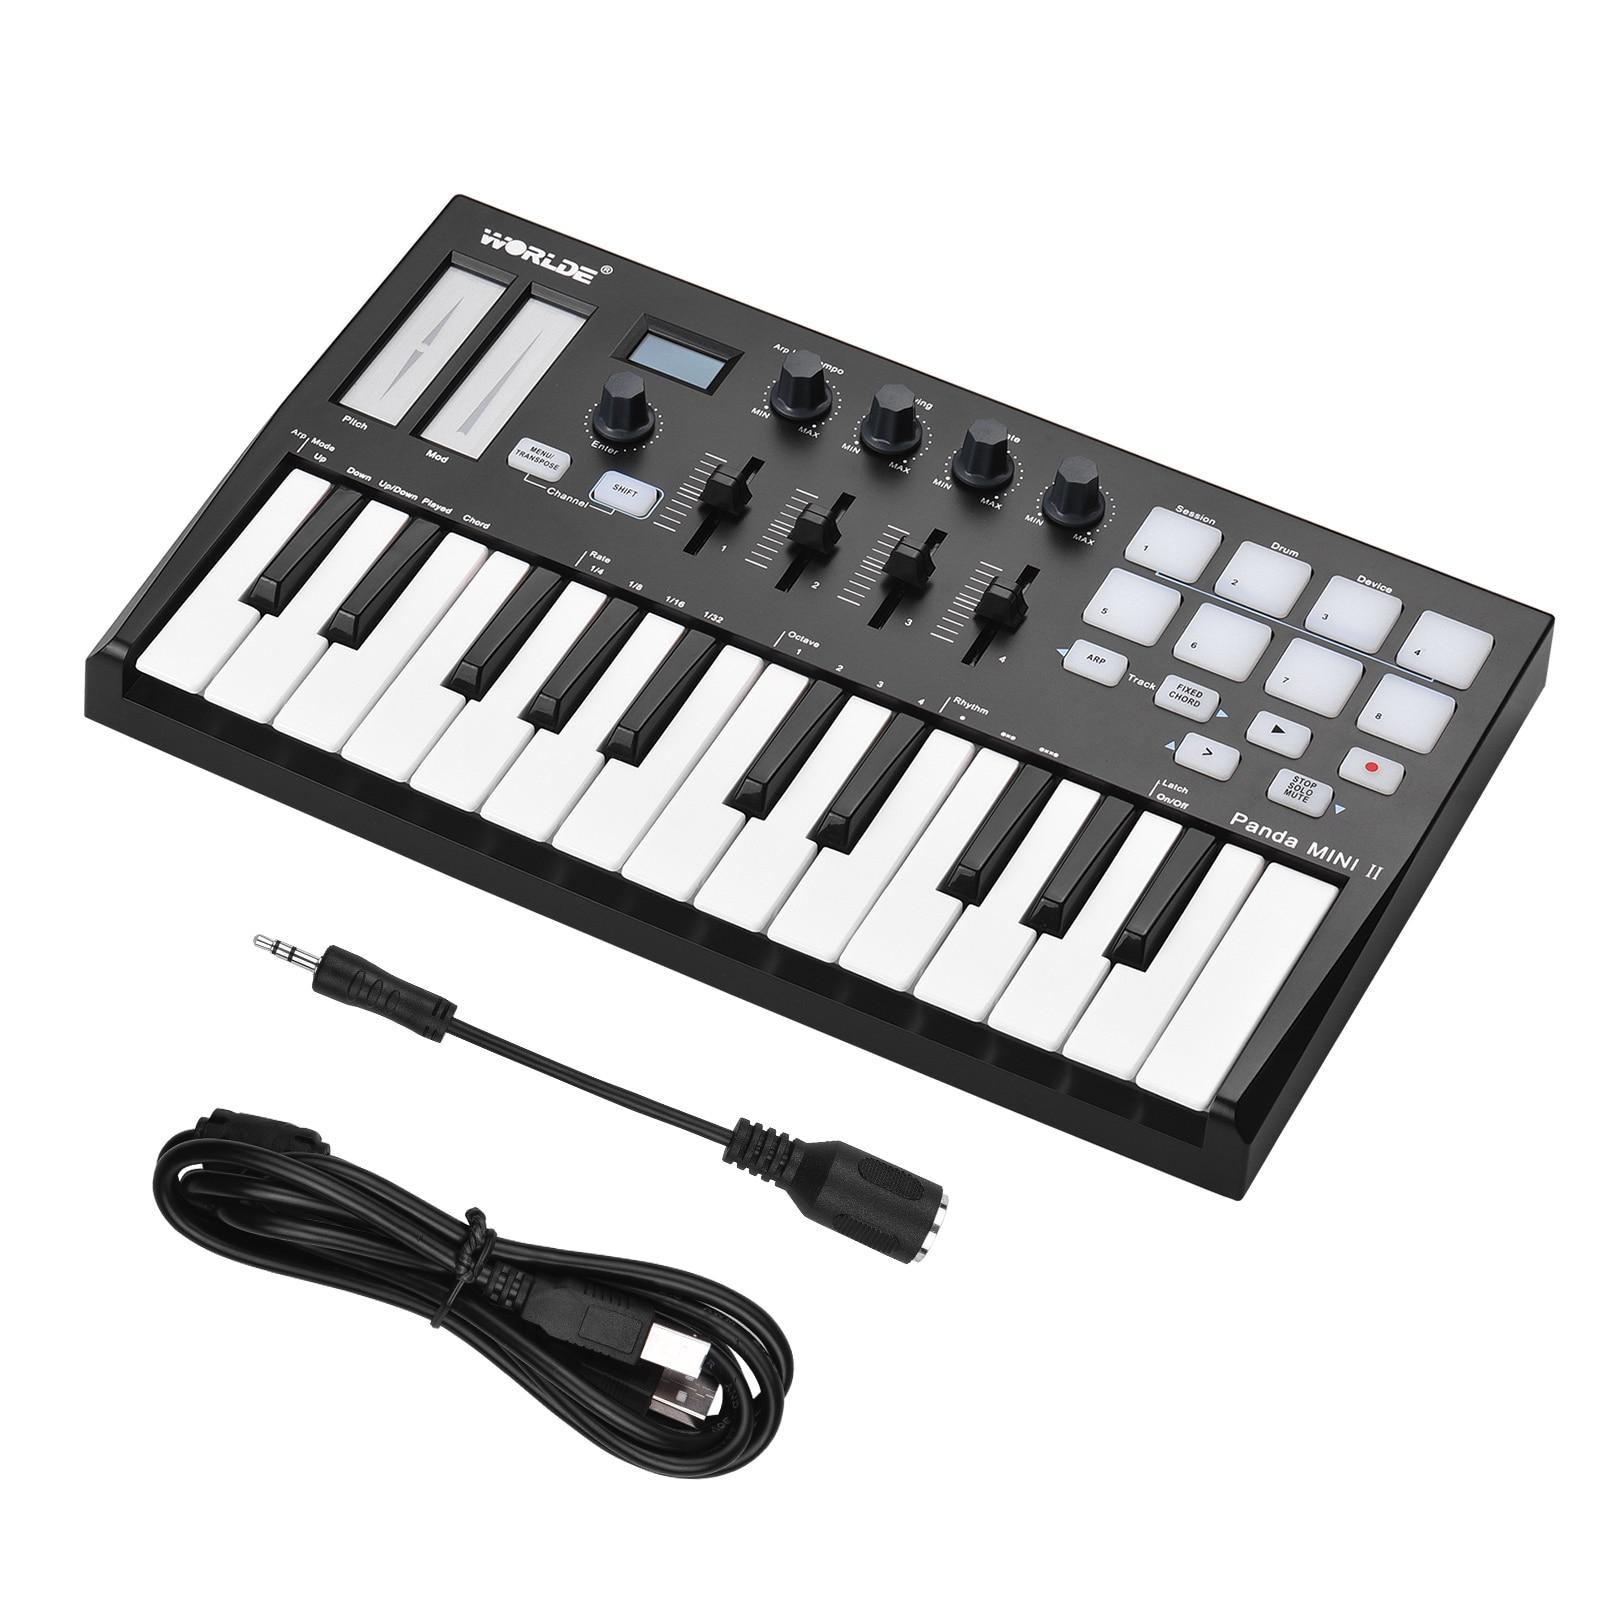 WORLDE Panda MINI II Portable 25-Key USB MIDI Keyboard Controller with 8 RGB Backlit Trigger Pads 4 Control Knobs 4 Sliders